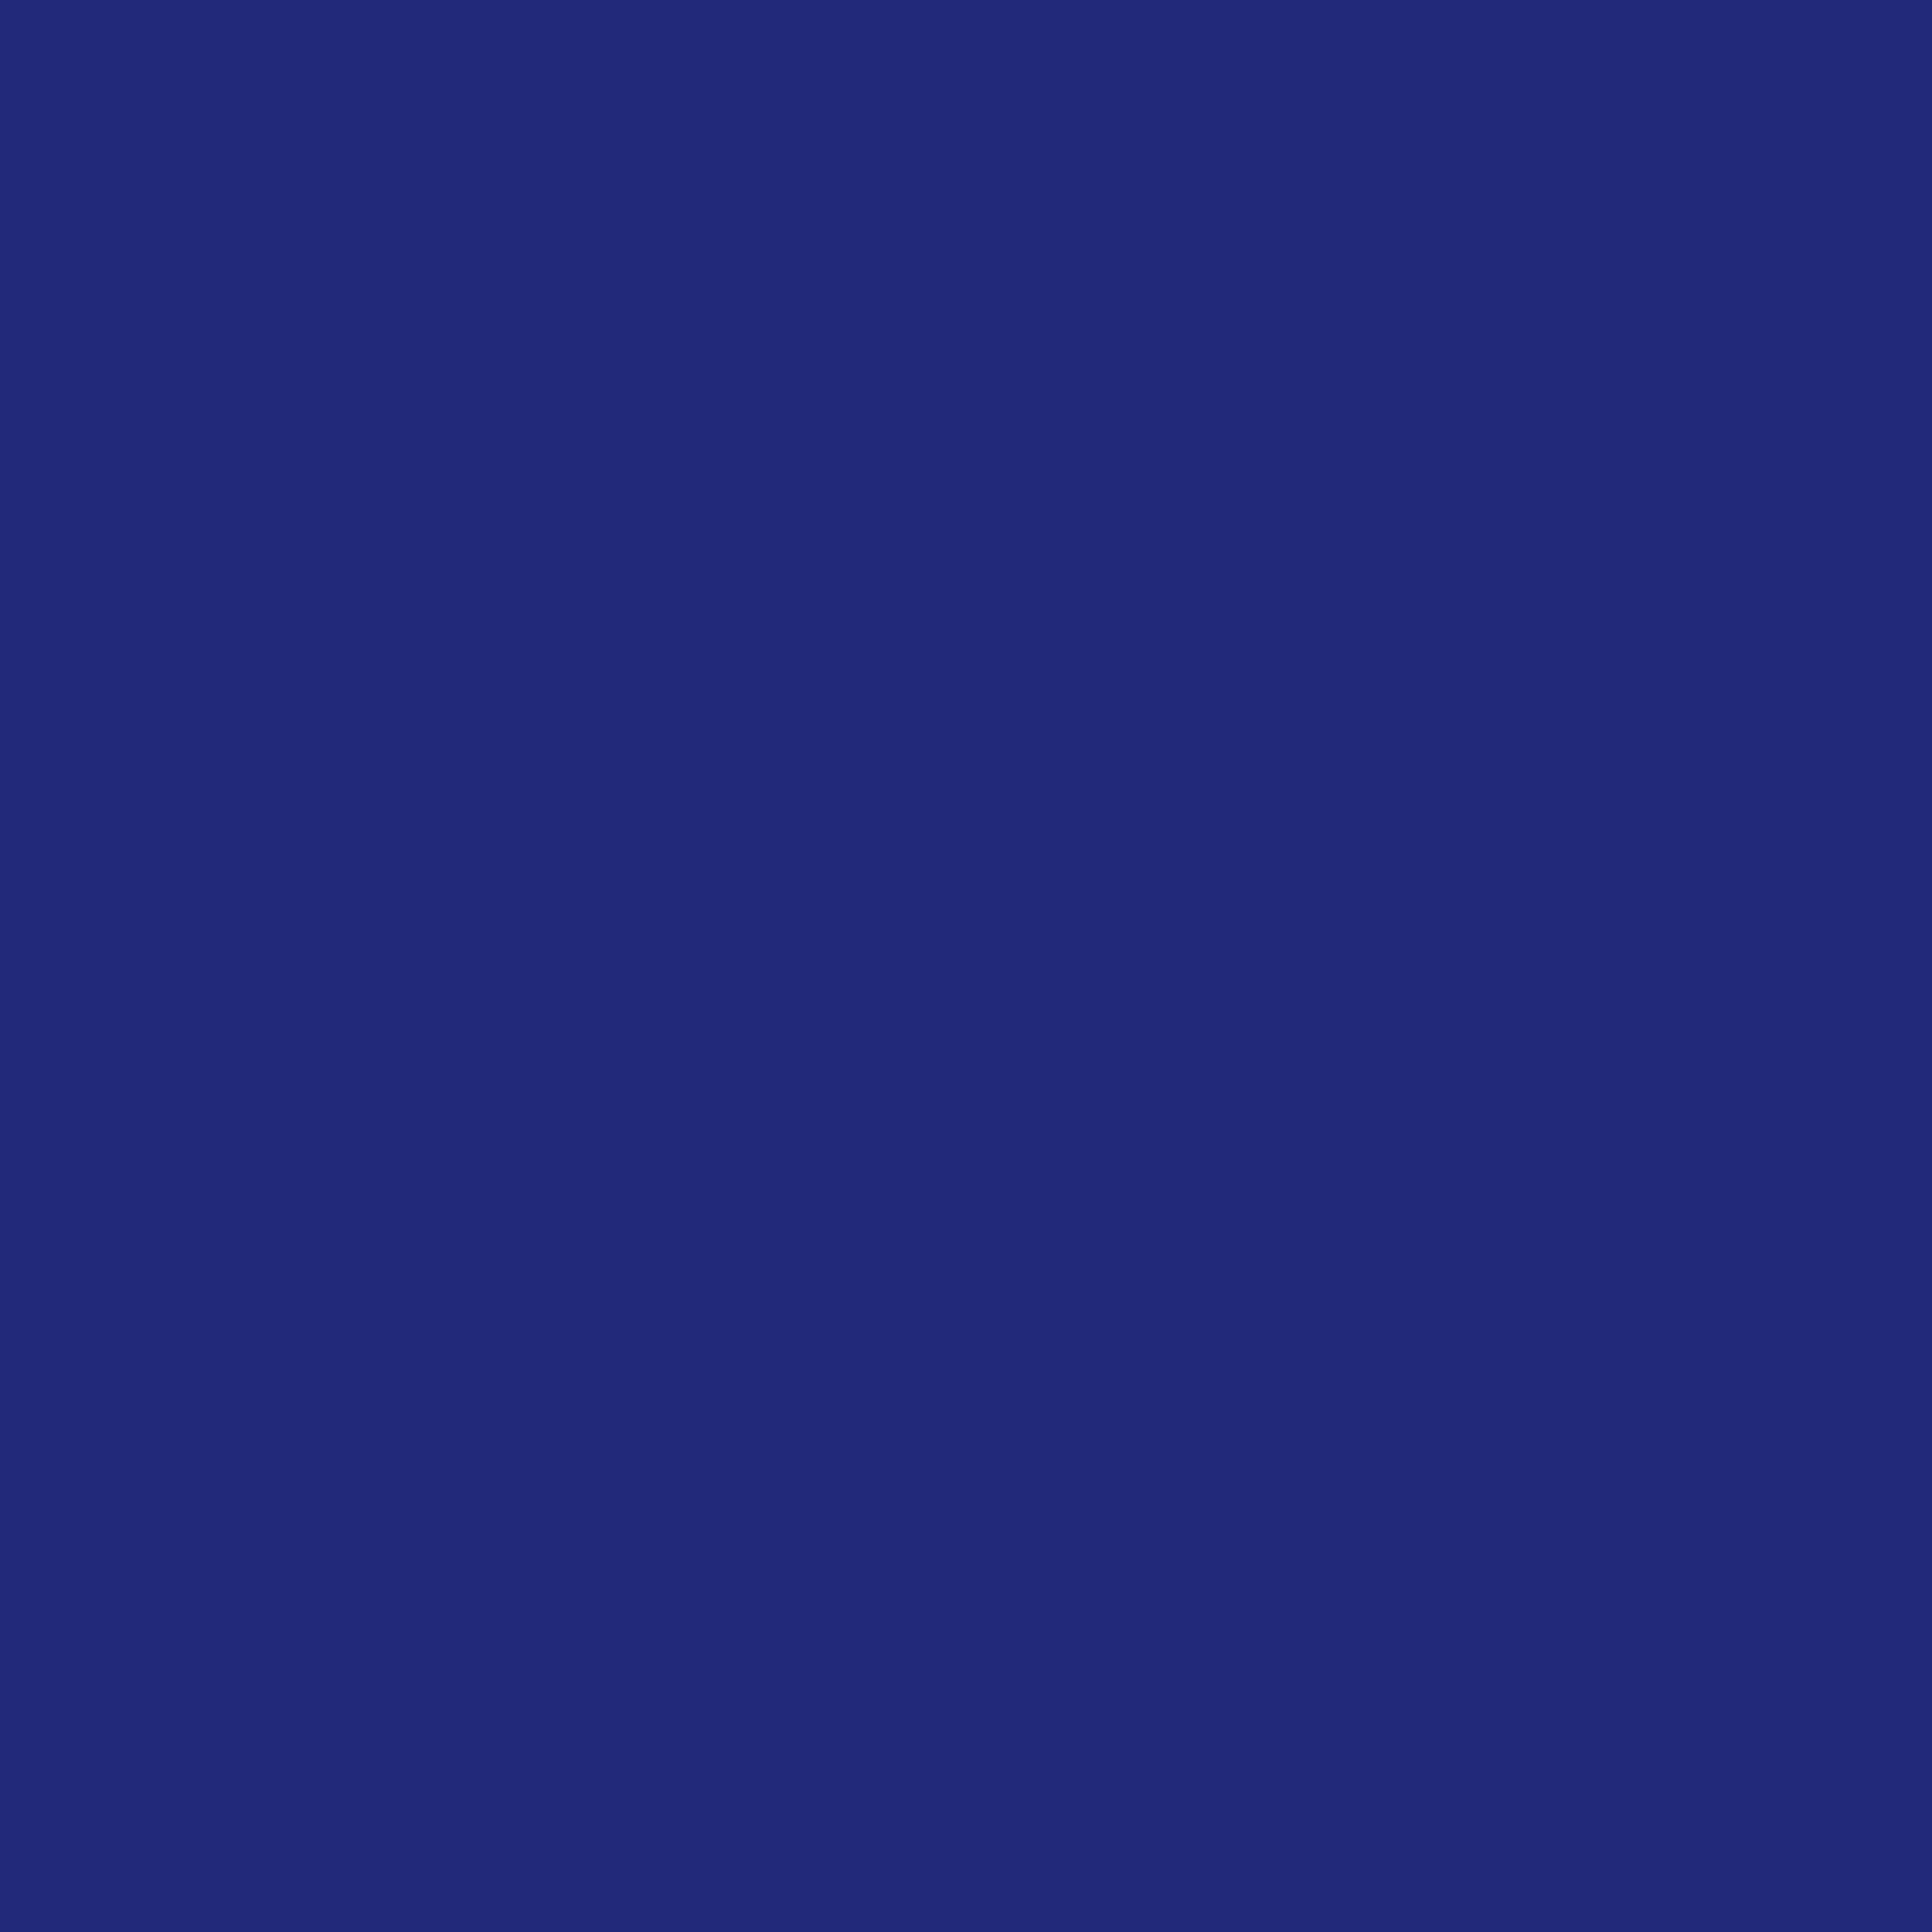 2048x2048 St Patricks Blue Solid Color Background